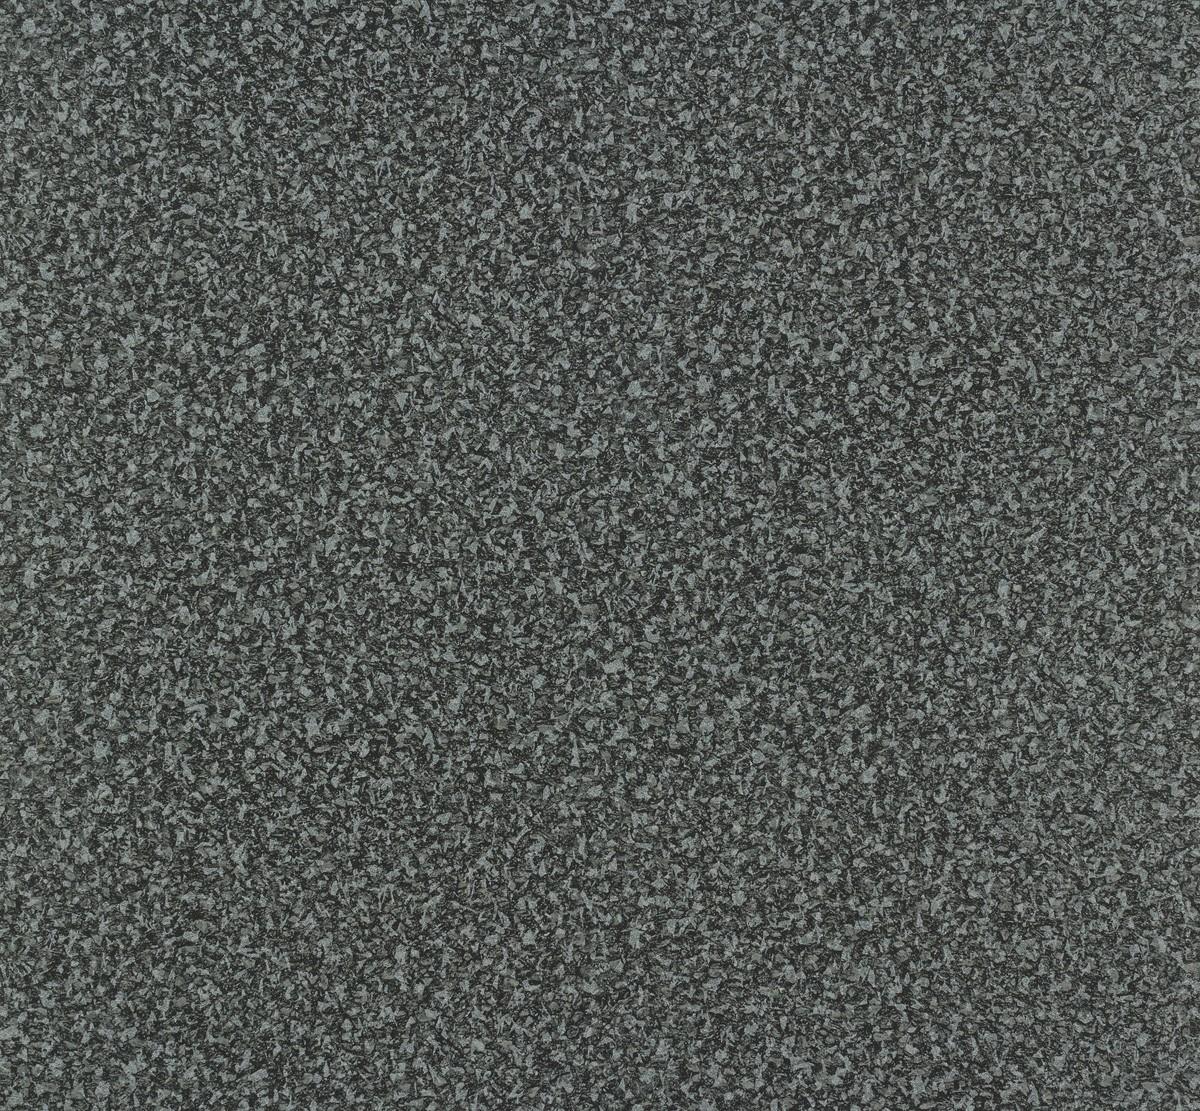 Vliestapete muster schwarz silber p s origin 42105 30 for Vliestapete muster